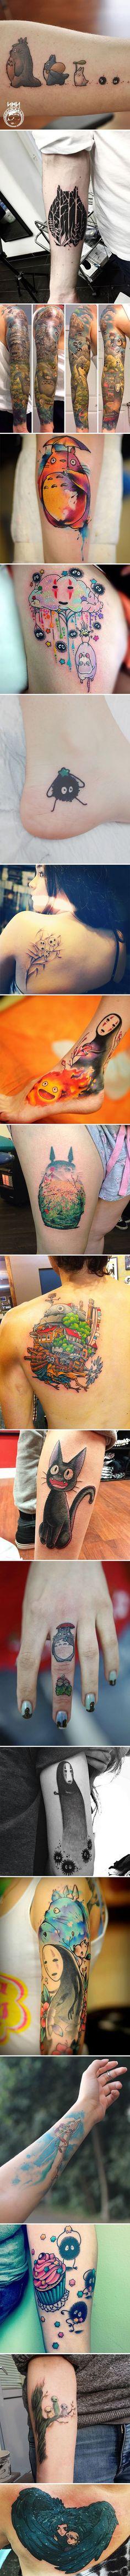 Studio Ghibli Tattoos Inspired By Miyazaki Films - 9GAG